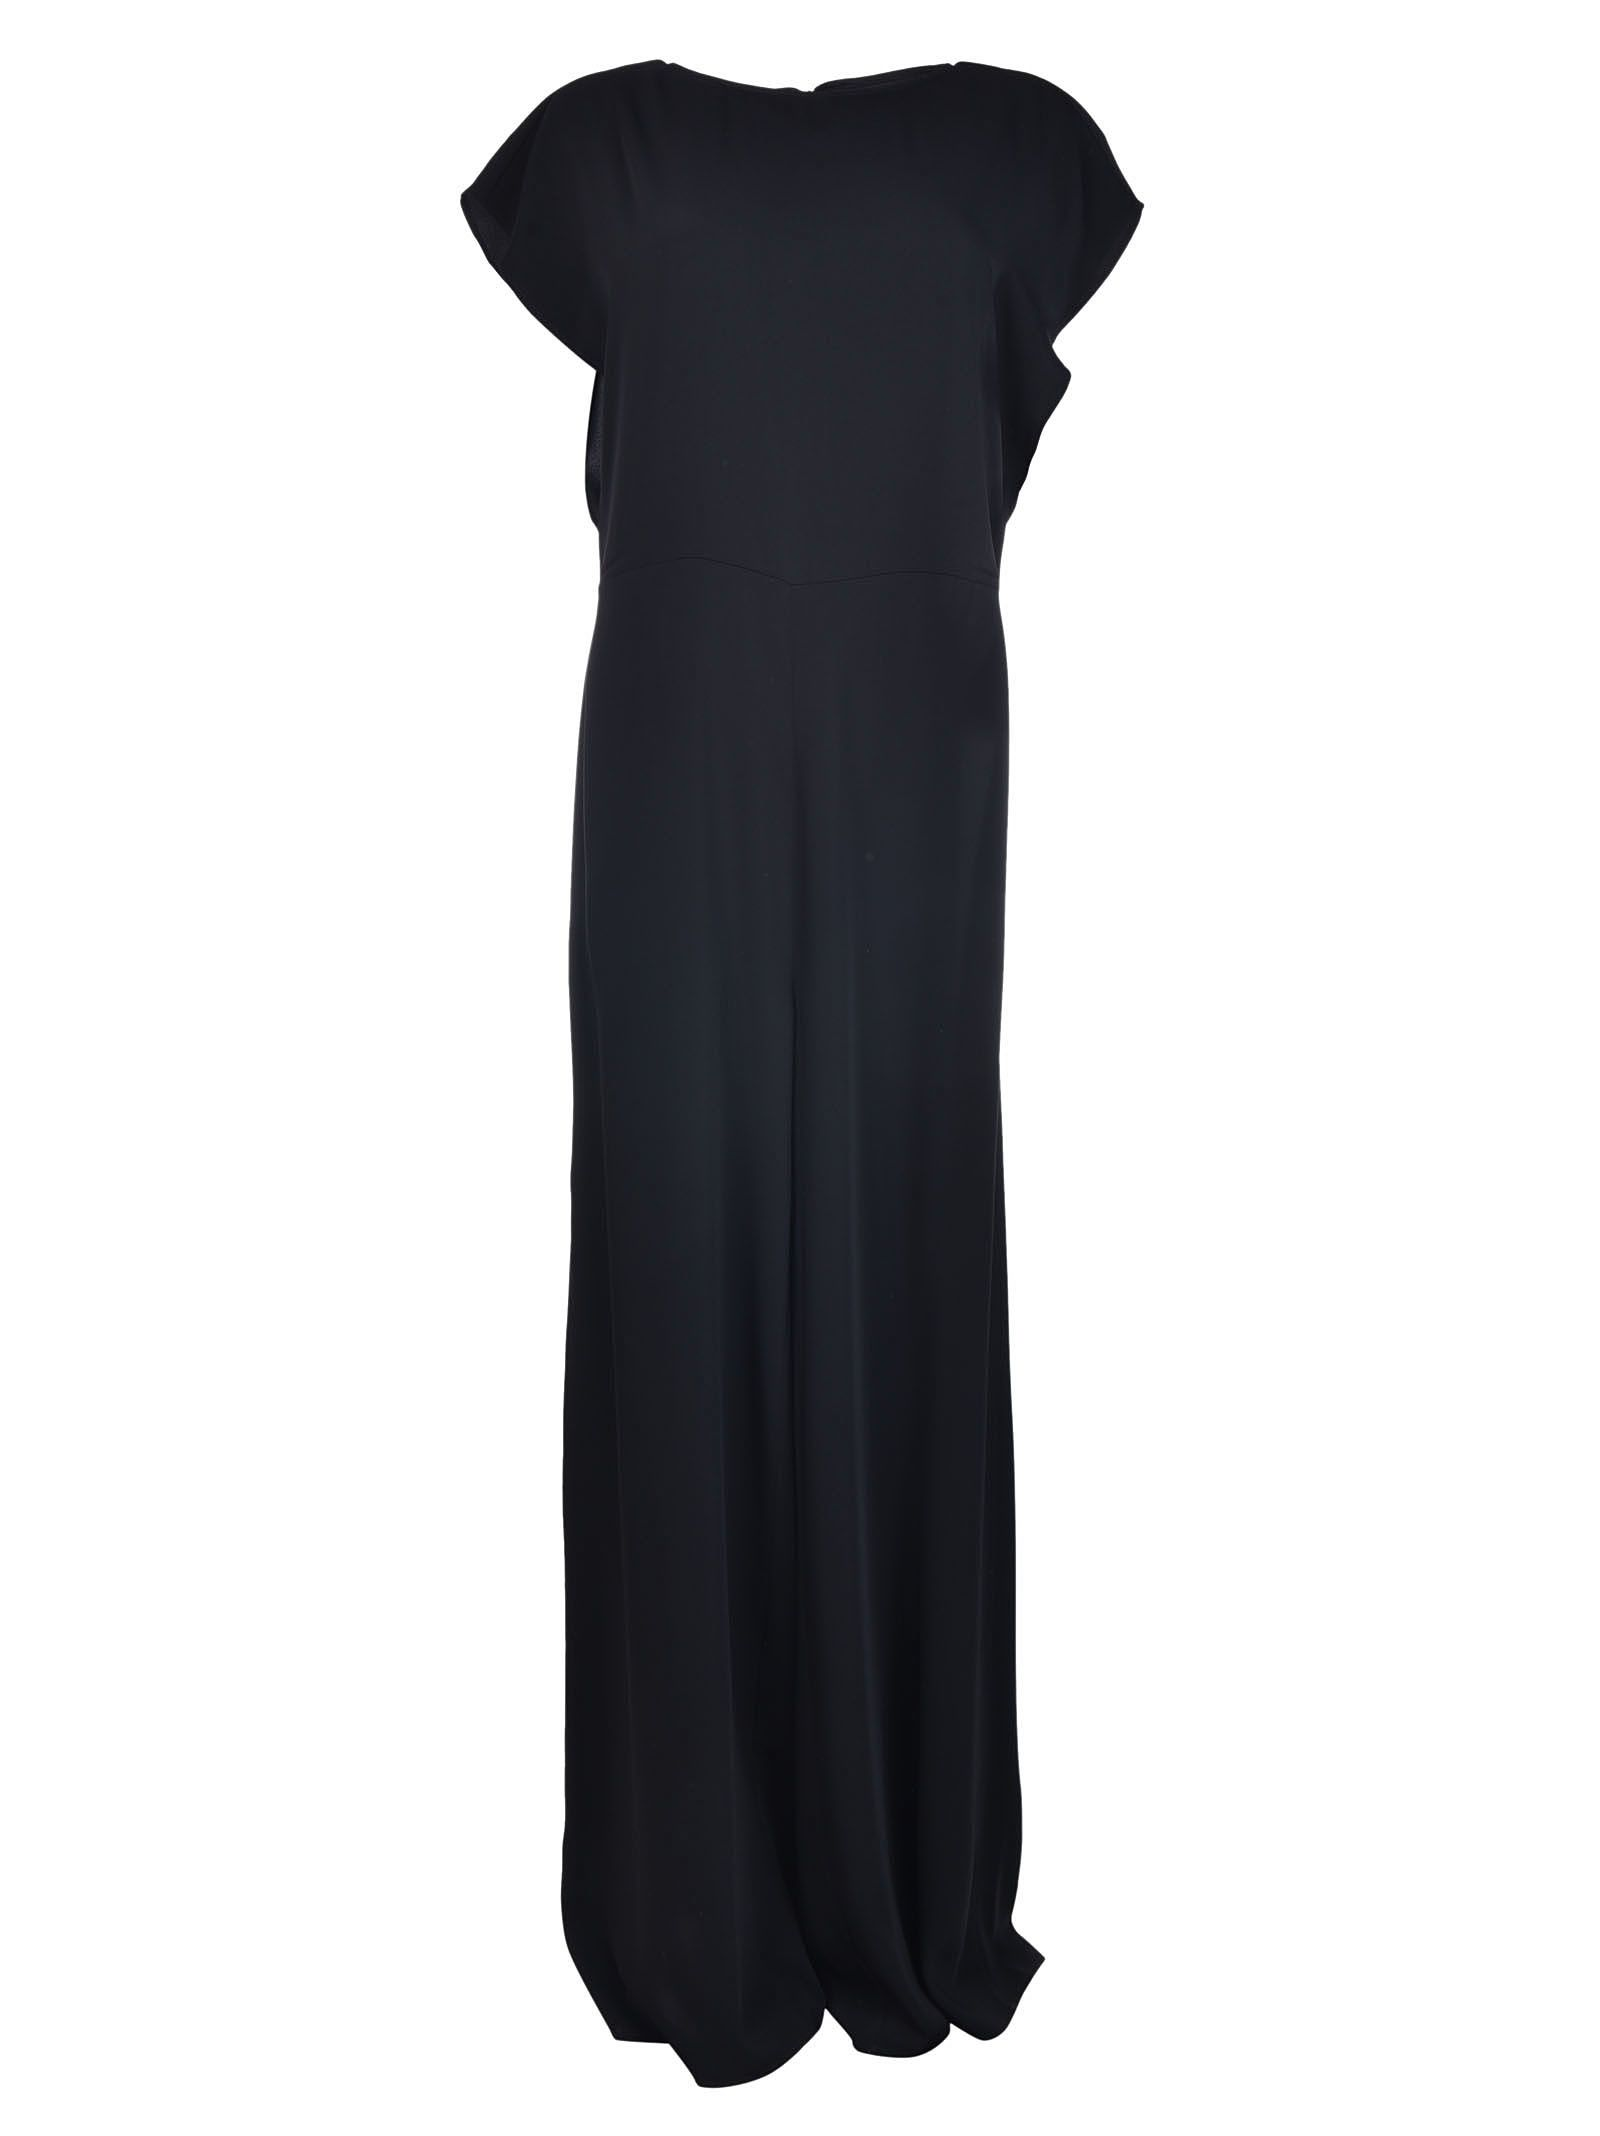 Maison Margiela Classic Maxi Dress